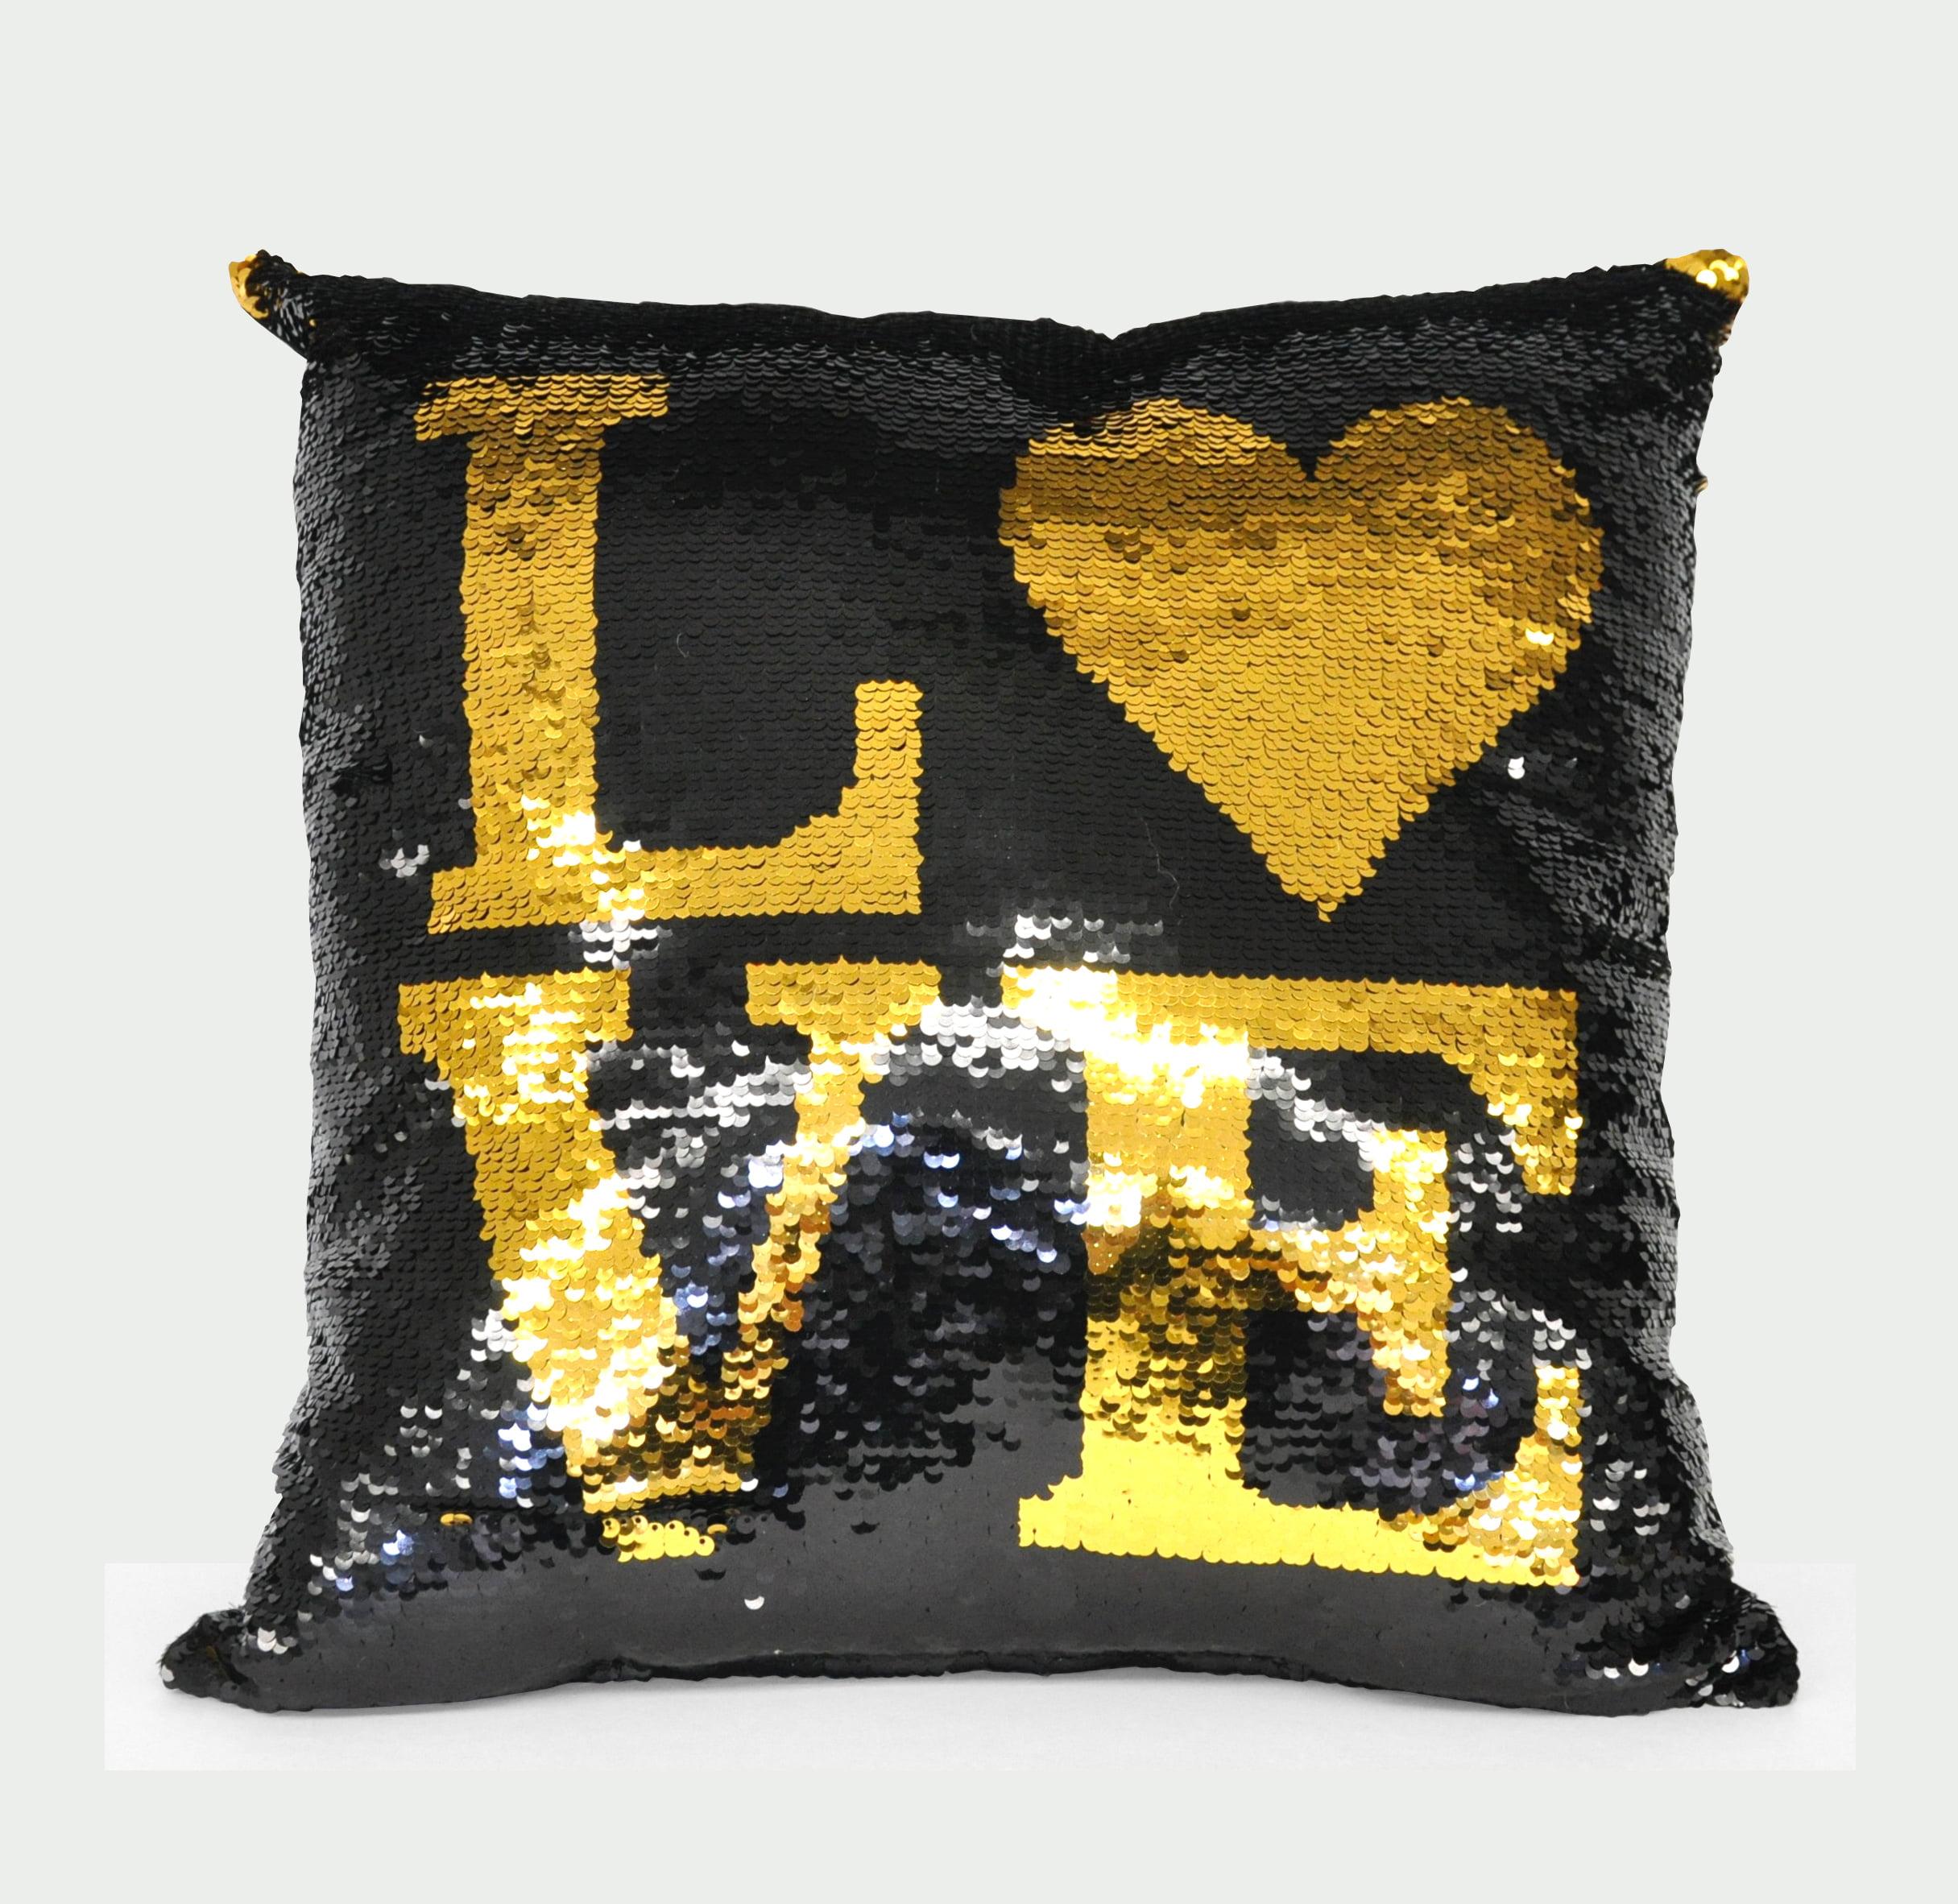 Mainstays Black Sparkle Lips Sequin Throw Pillow by Idea Nuova